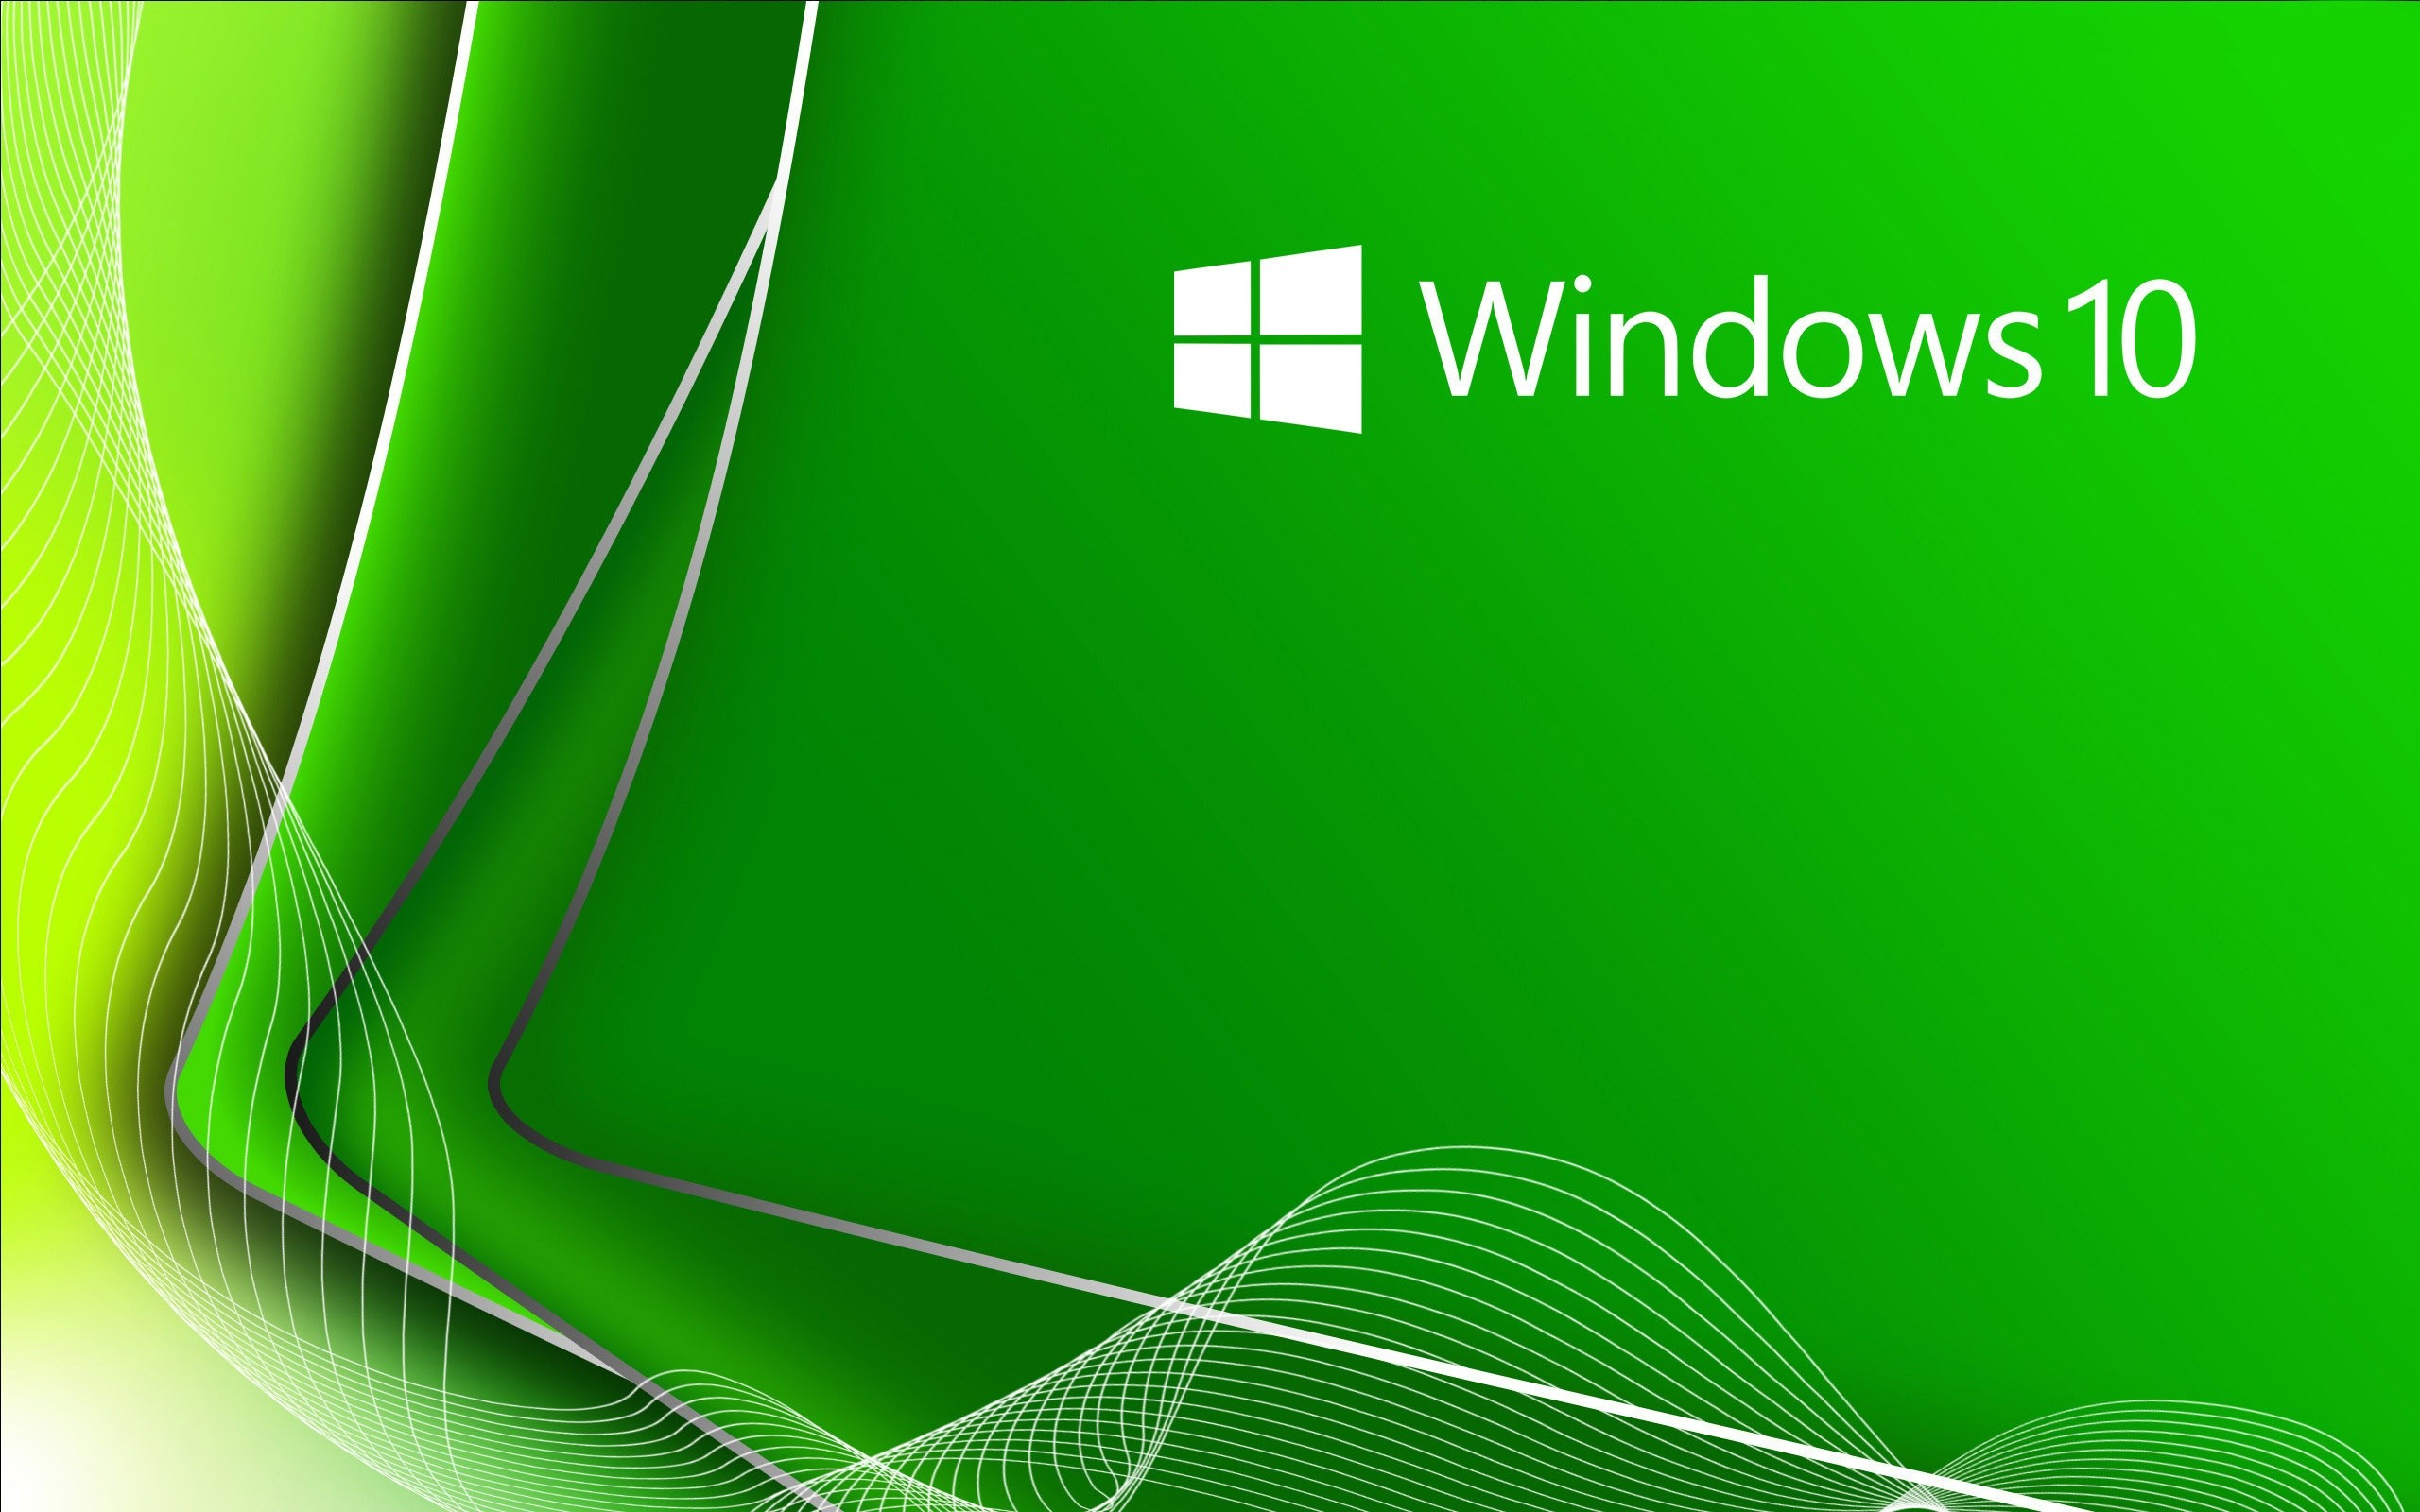 Cortana animated wallpaper windows 10 71 images - Windows animated wallpaper ...